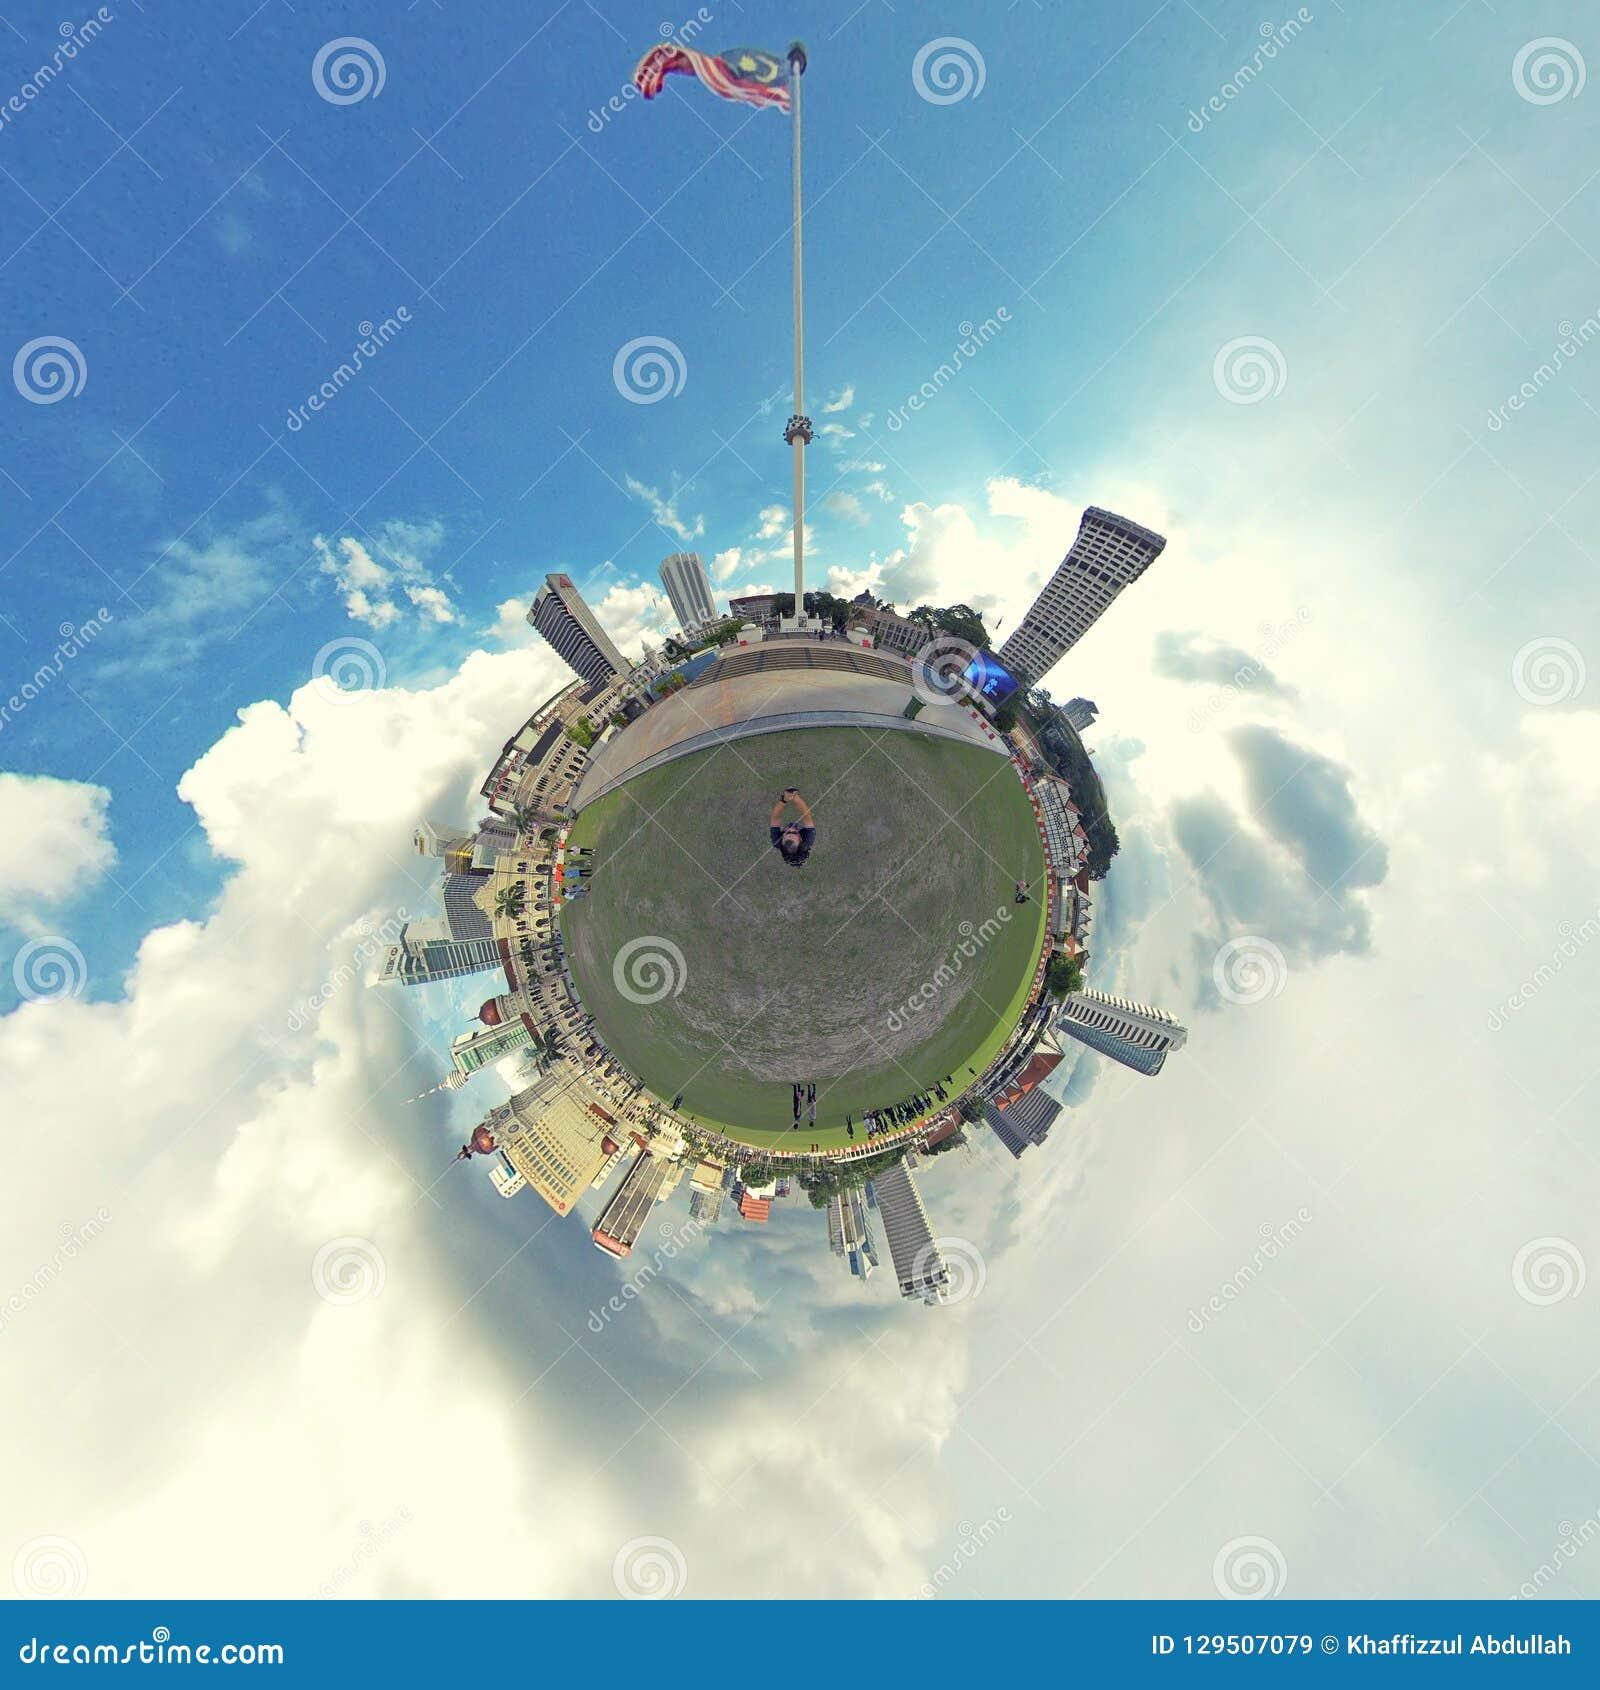 Little planet, Dataran Merdeka, Kuala Lumpur.